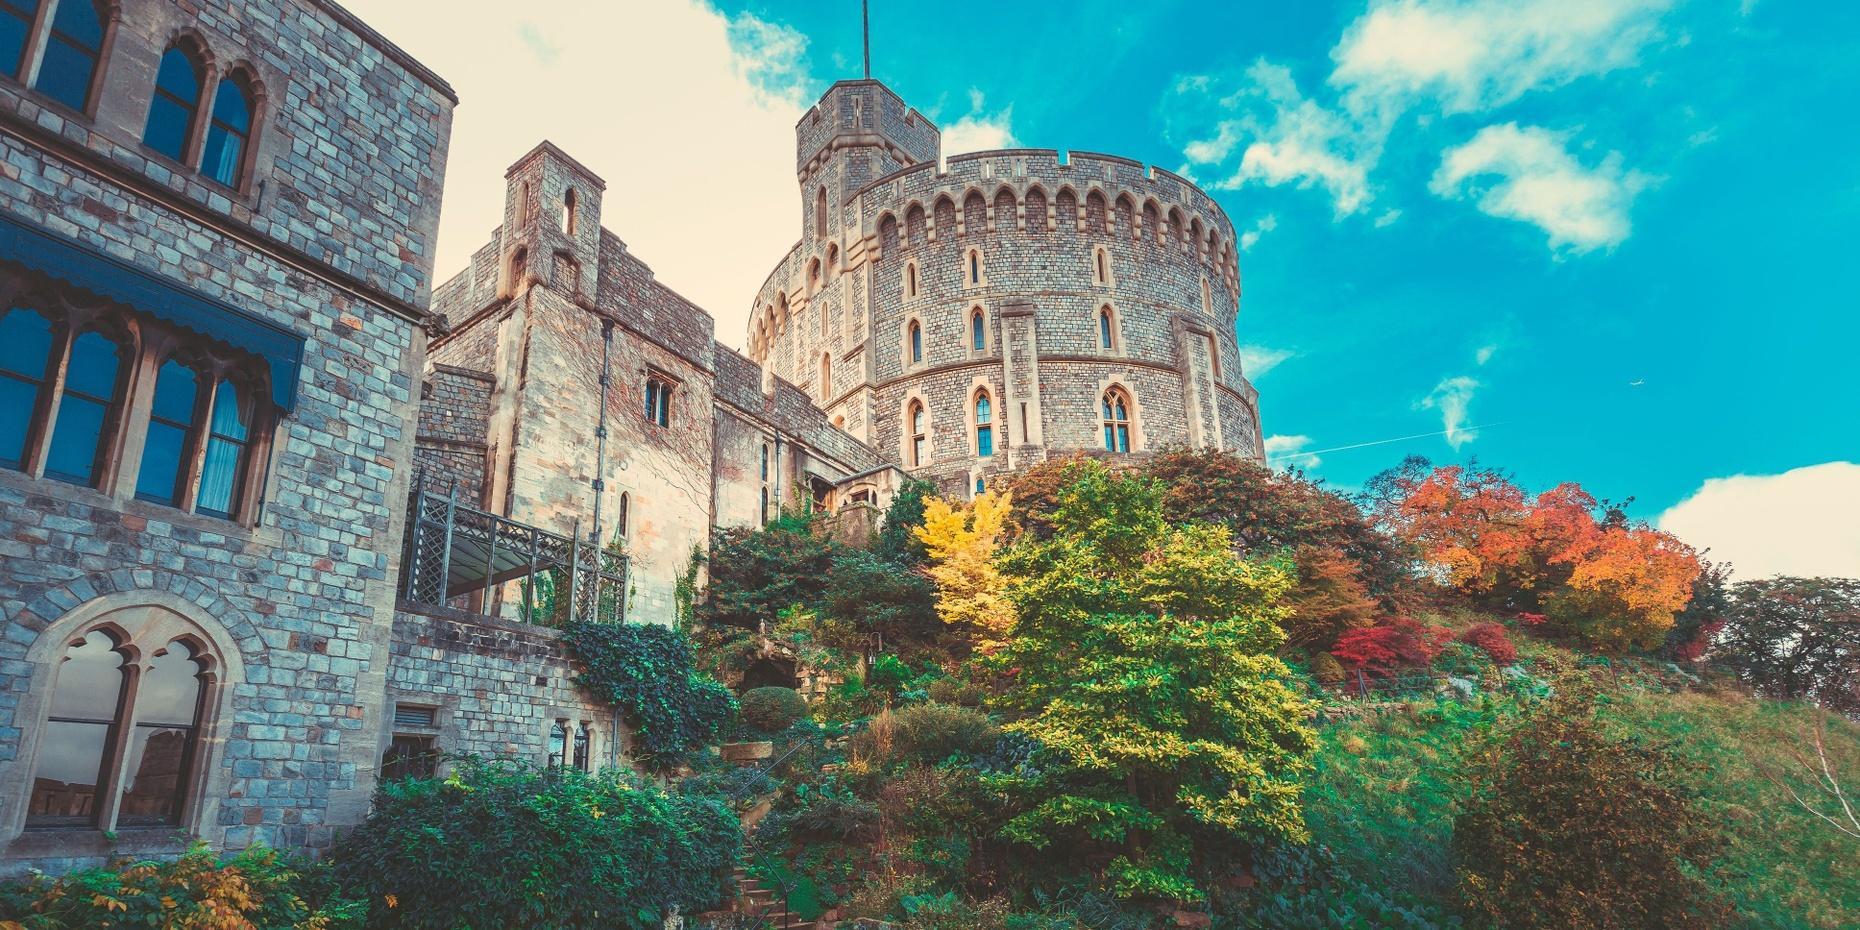 Bath & Windsor Castle